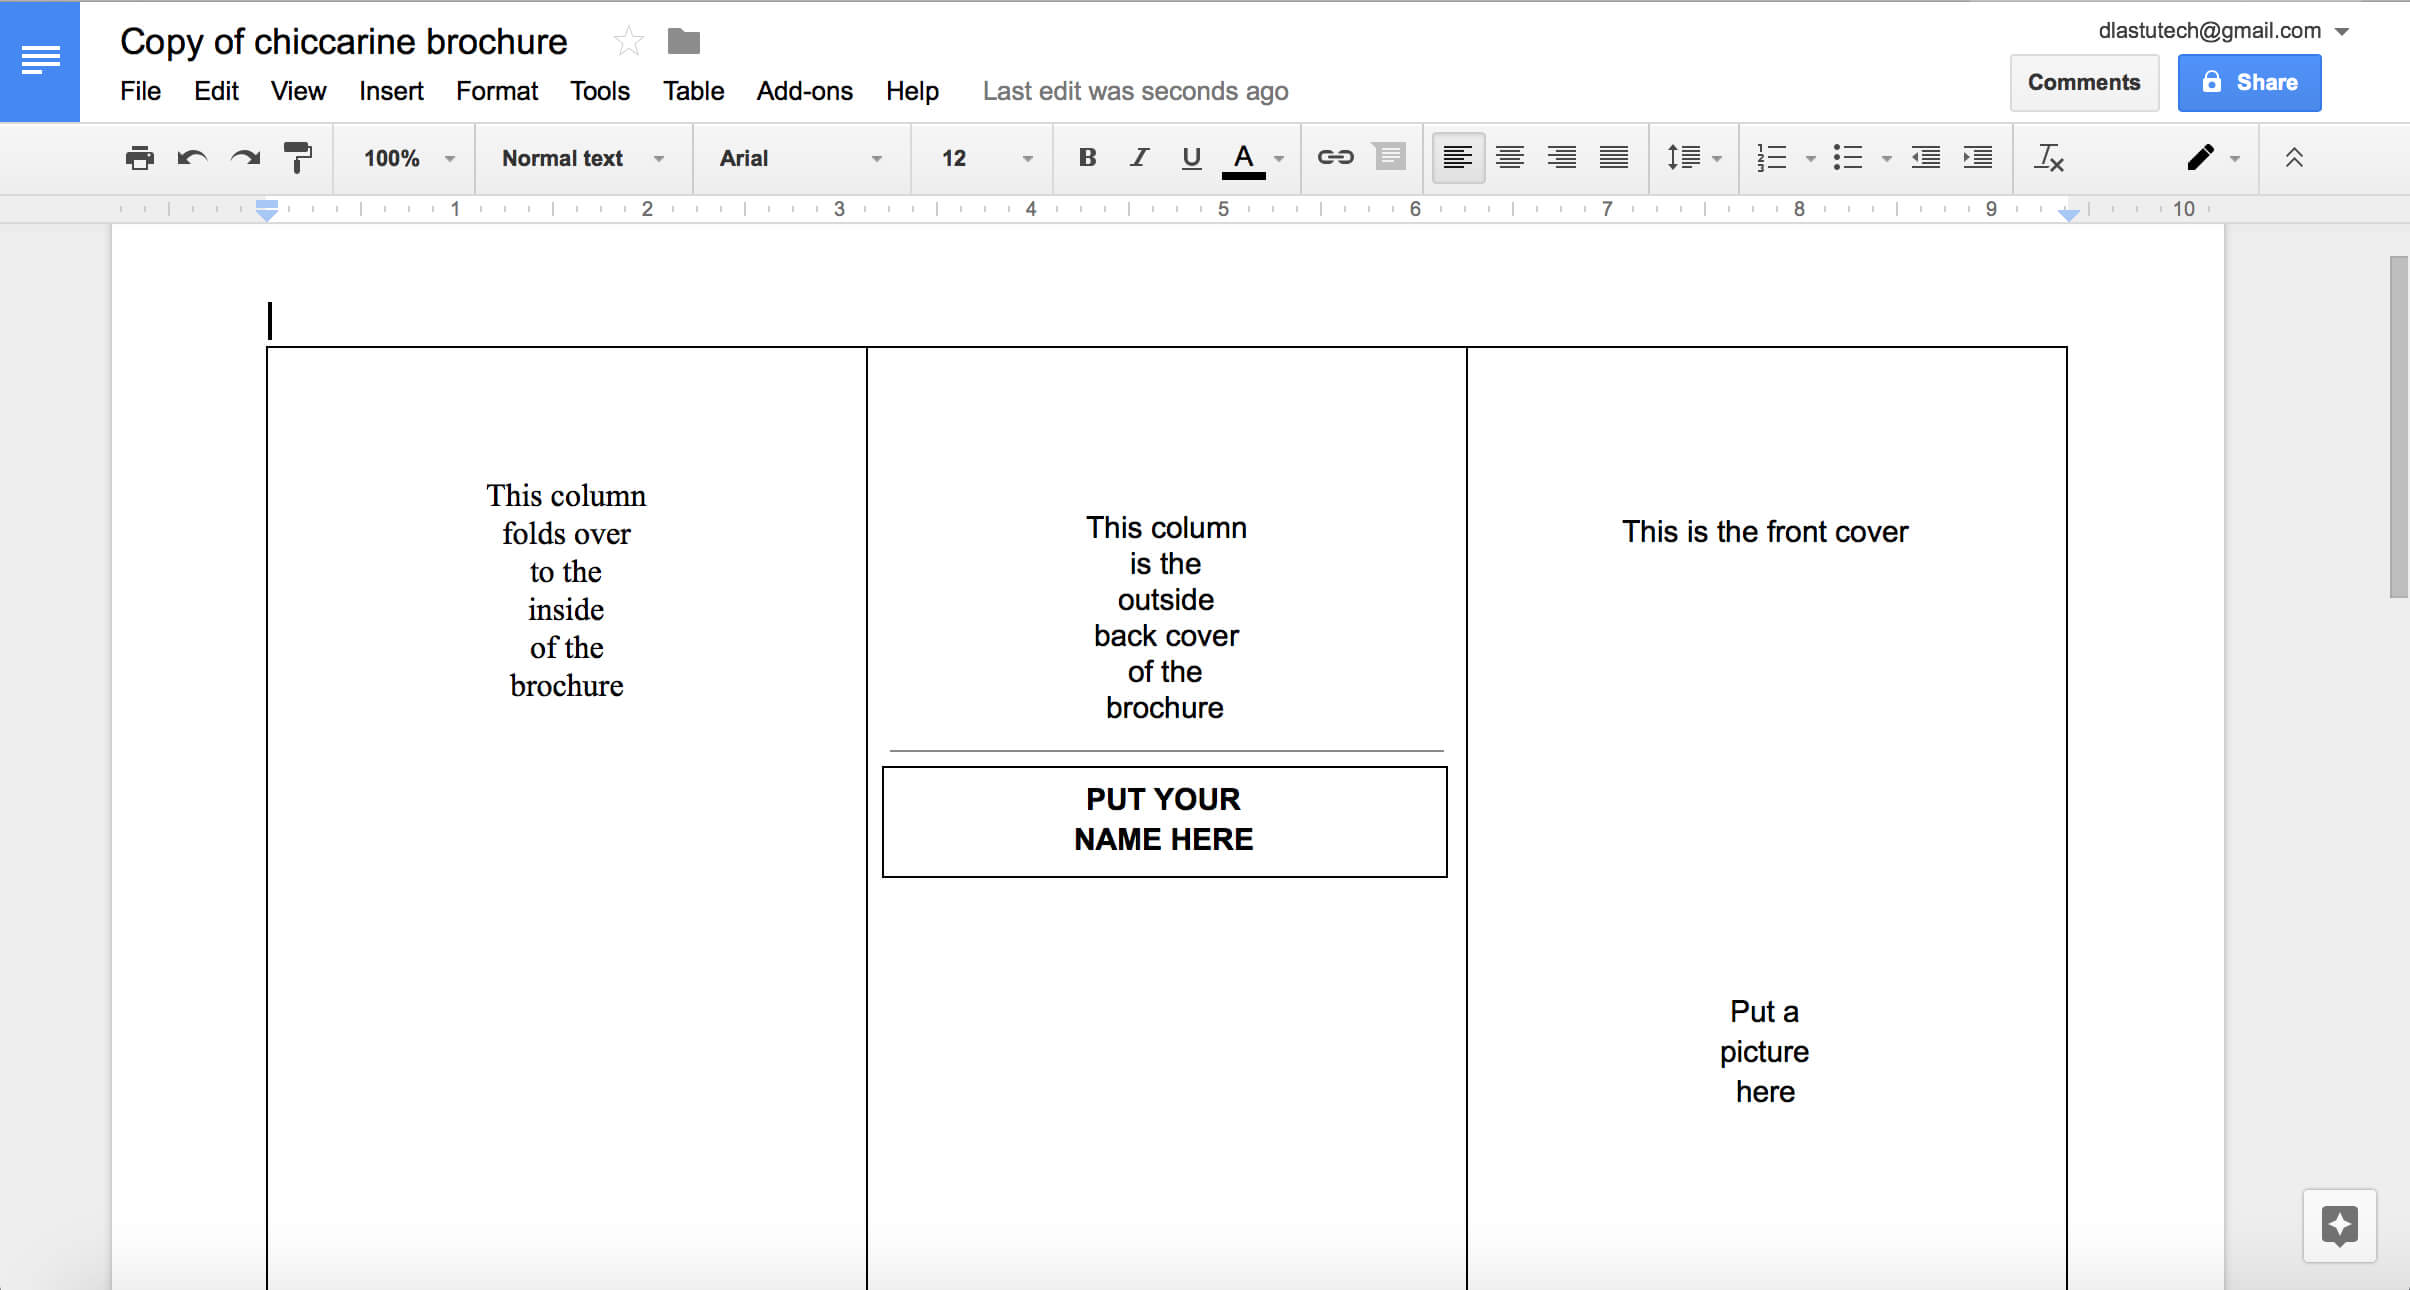 006 Template Ideas Tri Fold Pamphlet Google Docs Brochure Intended For Brochure Templates For Google Docs